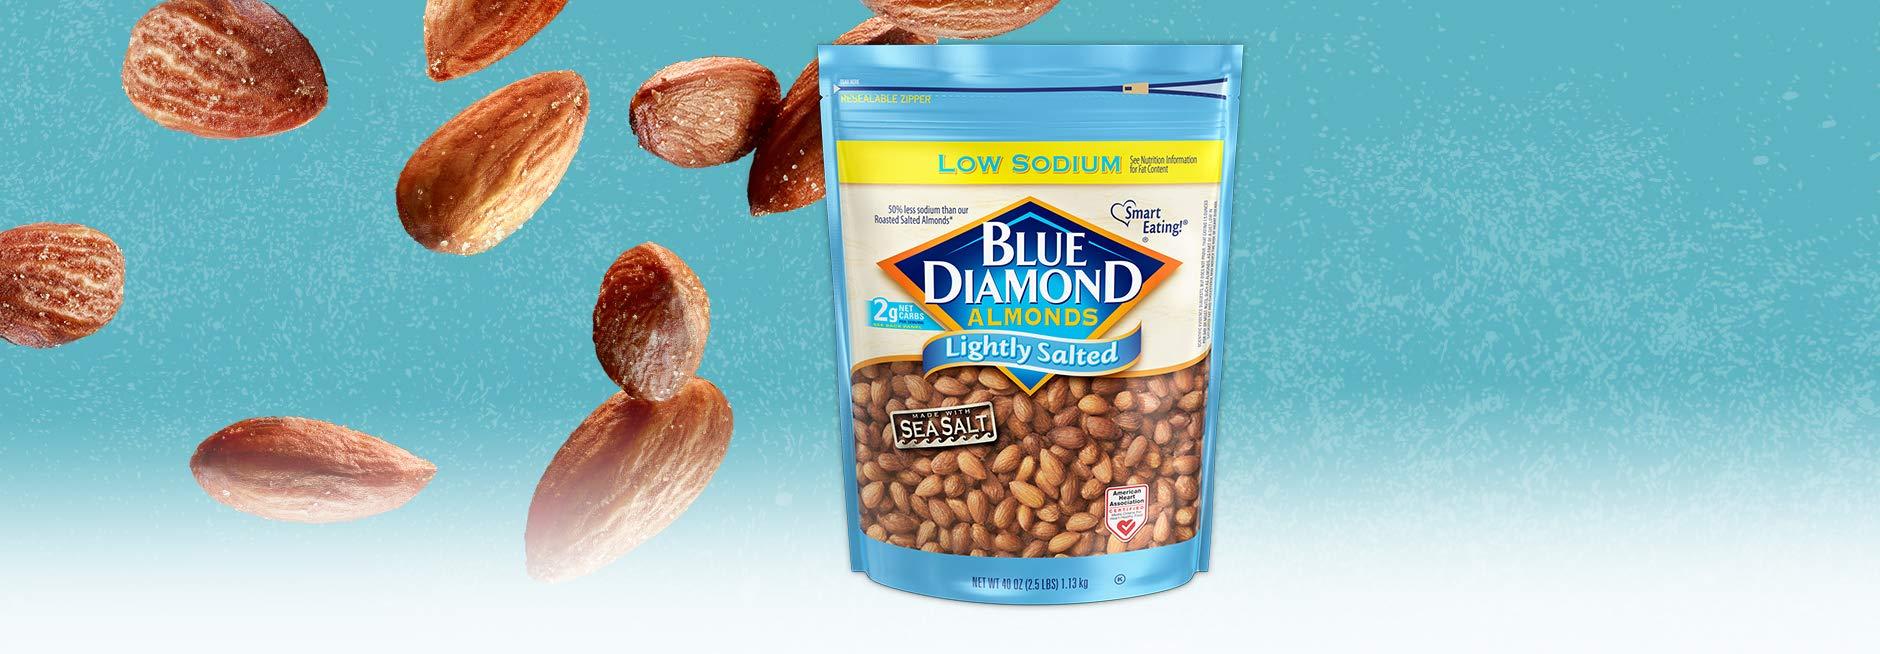 Blue Diamond Almonds Low Sodium Lightly Salted, 40 oz by Blue Diamond Almonds (Image #3)